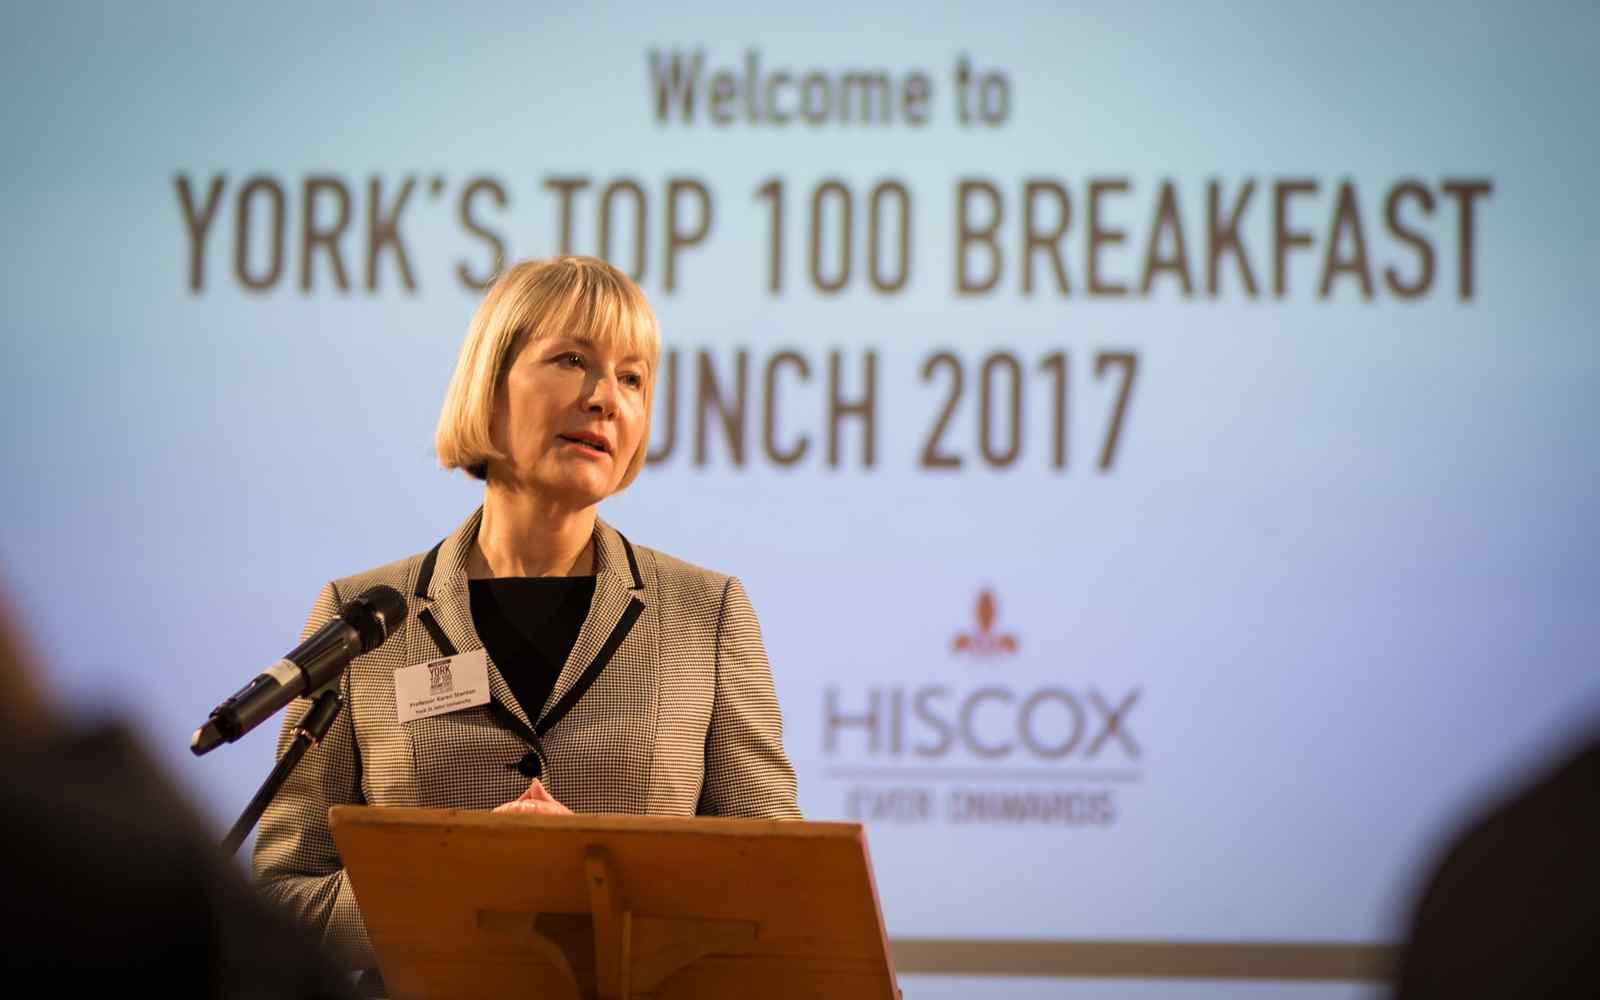 Prof Karen Stanton VC YSJU at York Top 100 Businesses